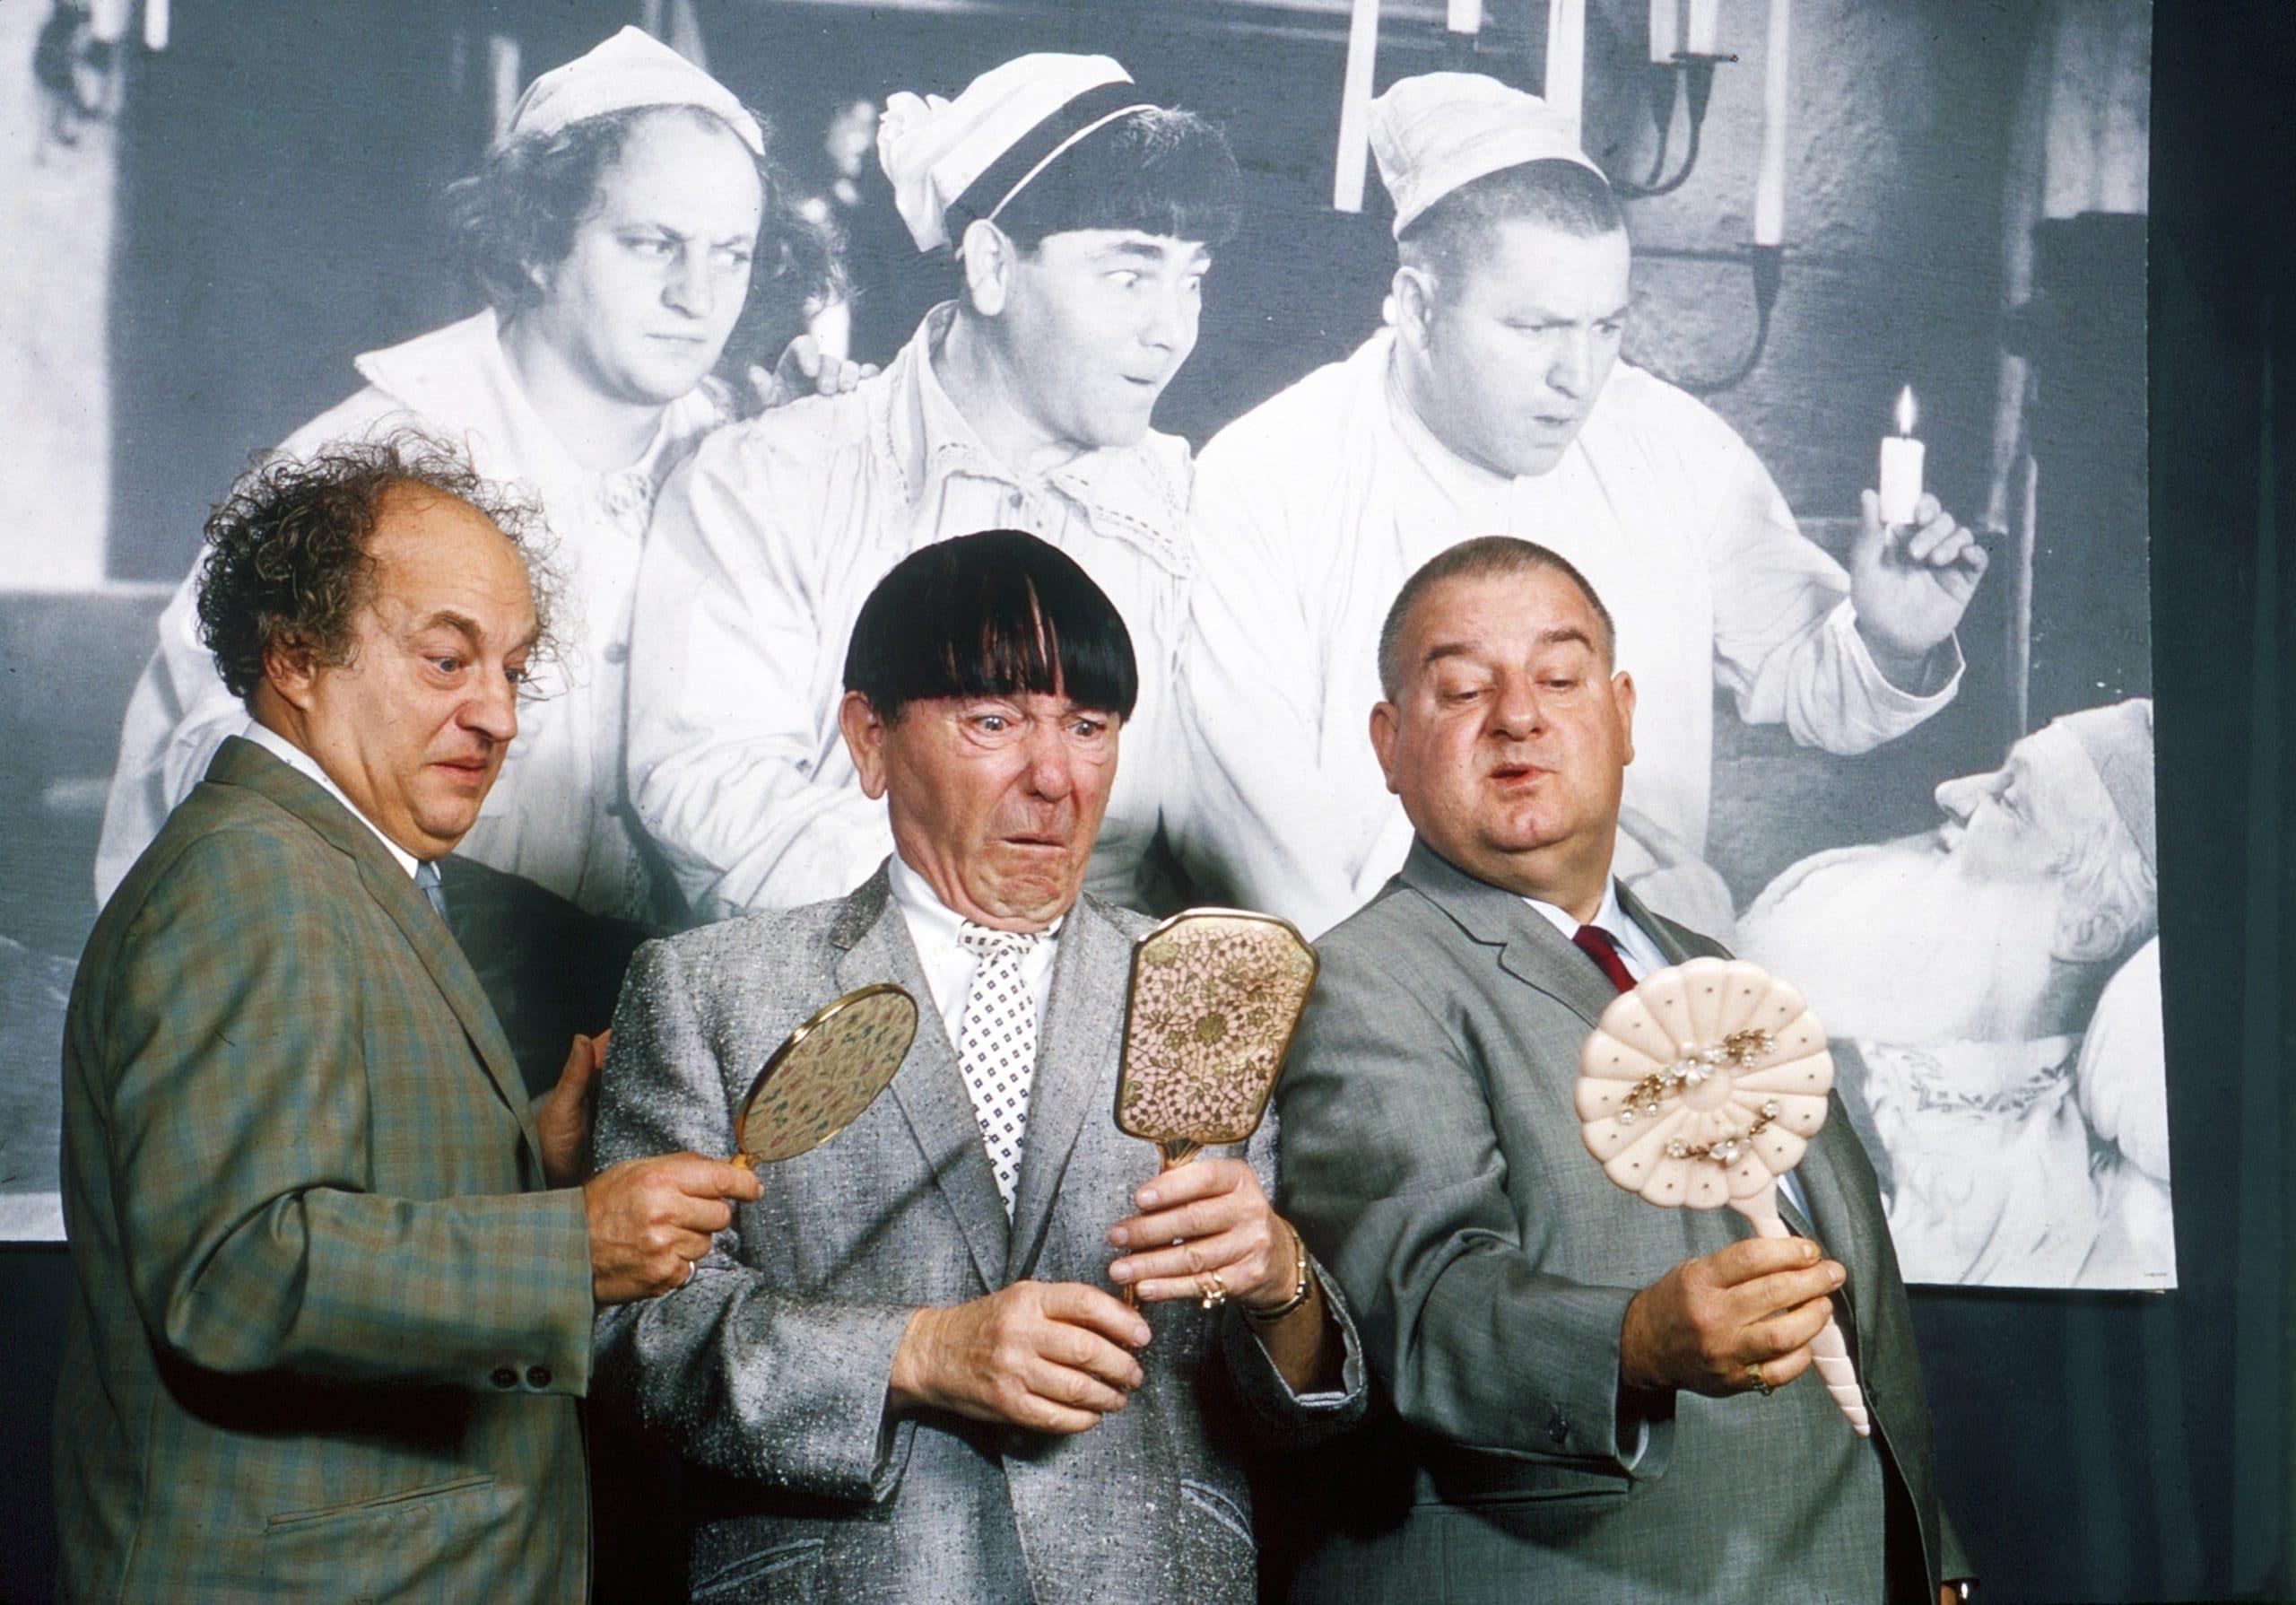 THE THREE STOOGES, from left: Larry Fine, Moe Howard, Joe DeRita